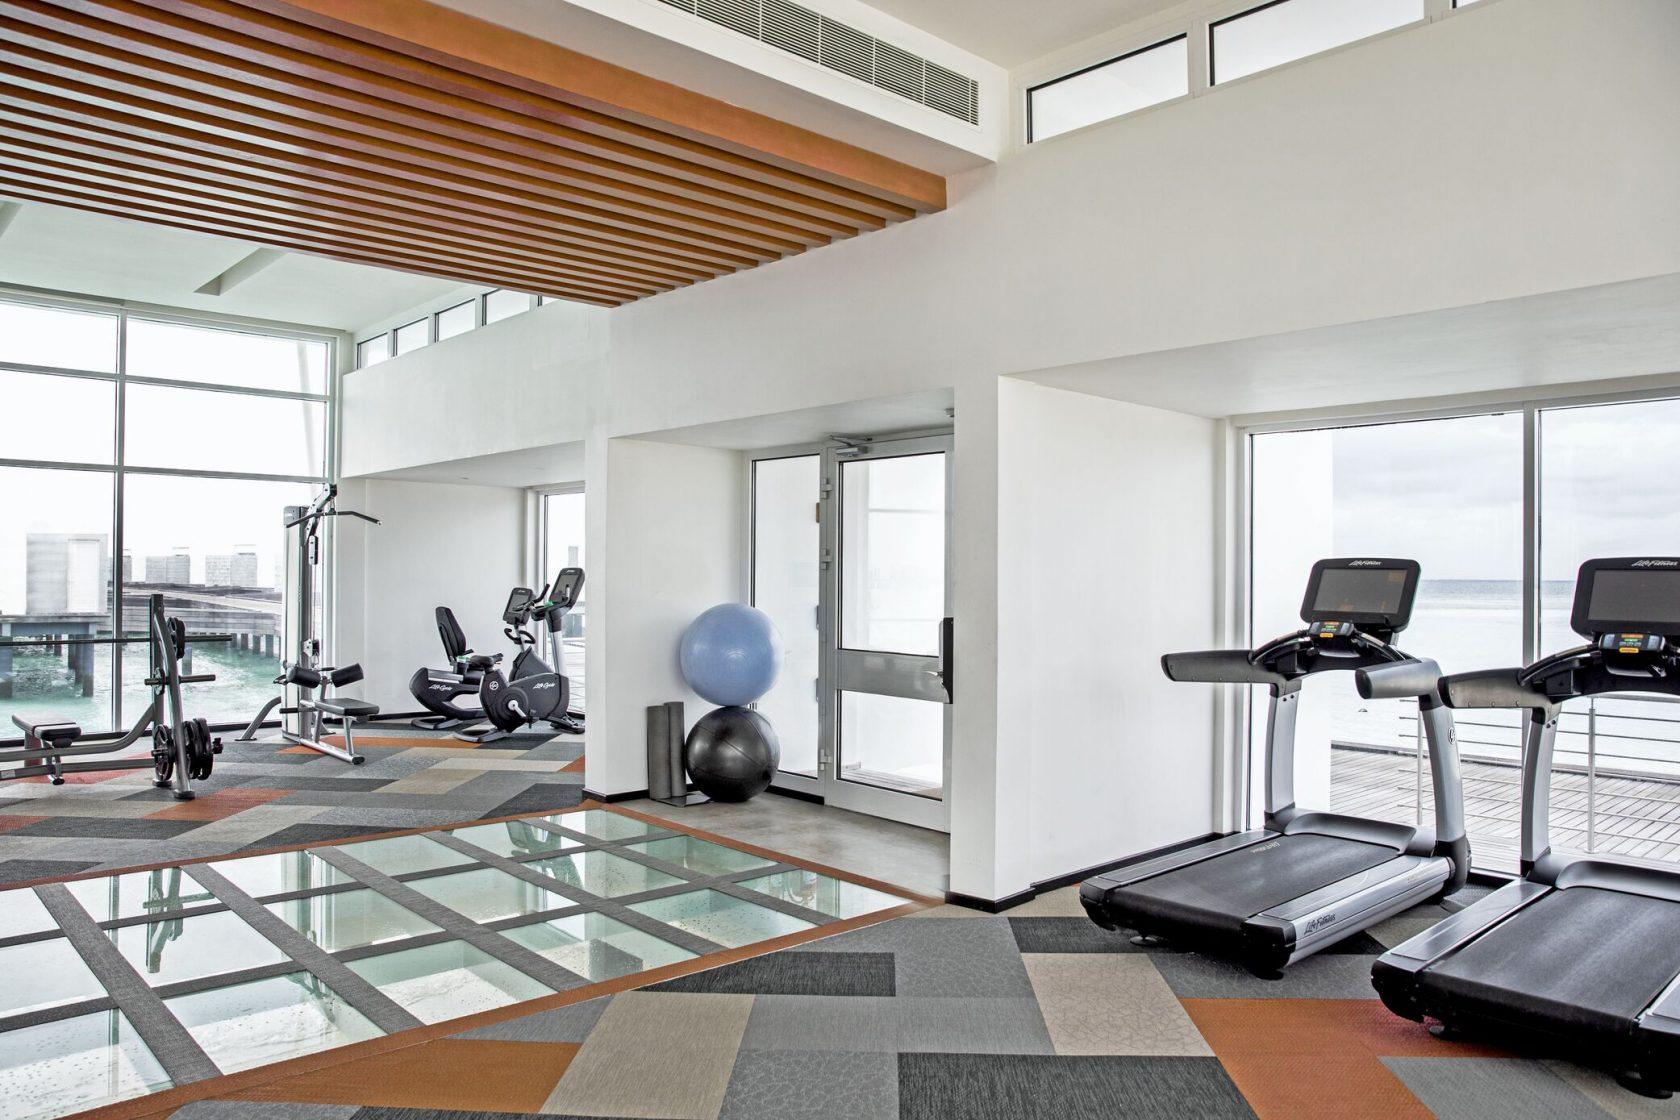 Jumeirah Maldives Fitness Centre